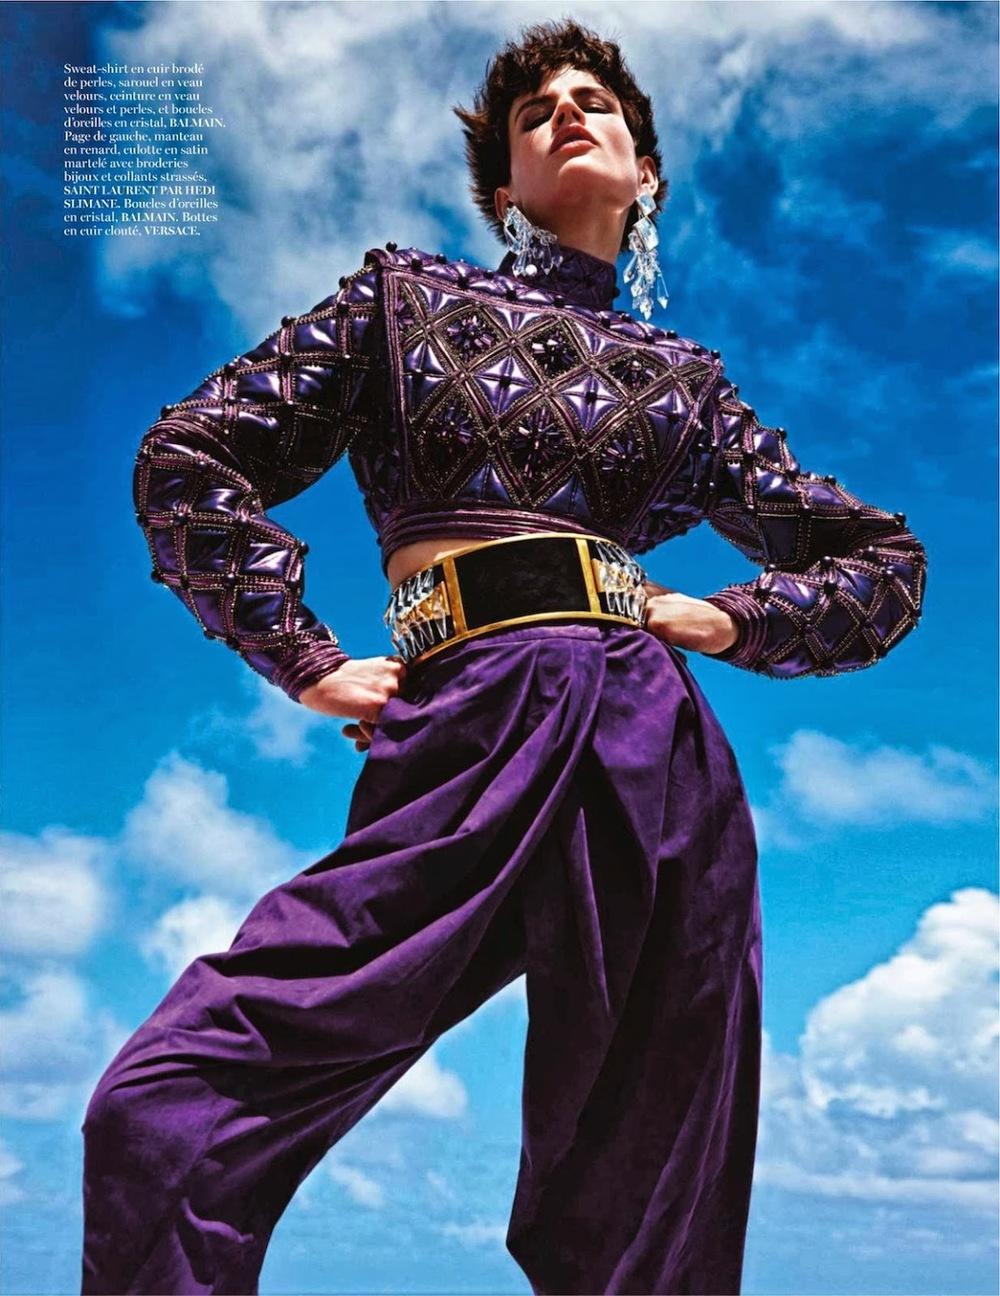 Purple Extreme: Saskia De Brauw wears Balmain in this colorful and fantastic editorial, via Vogue Paris